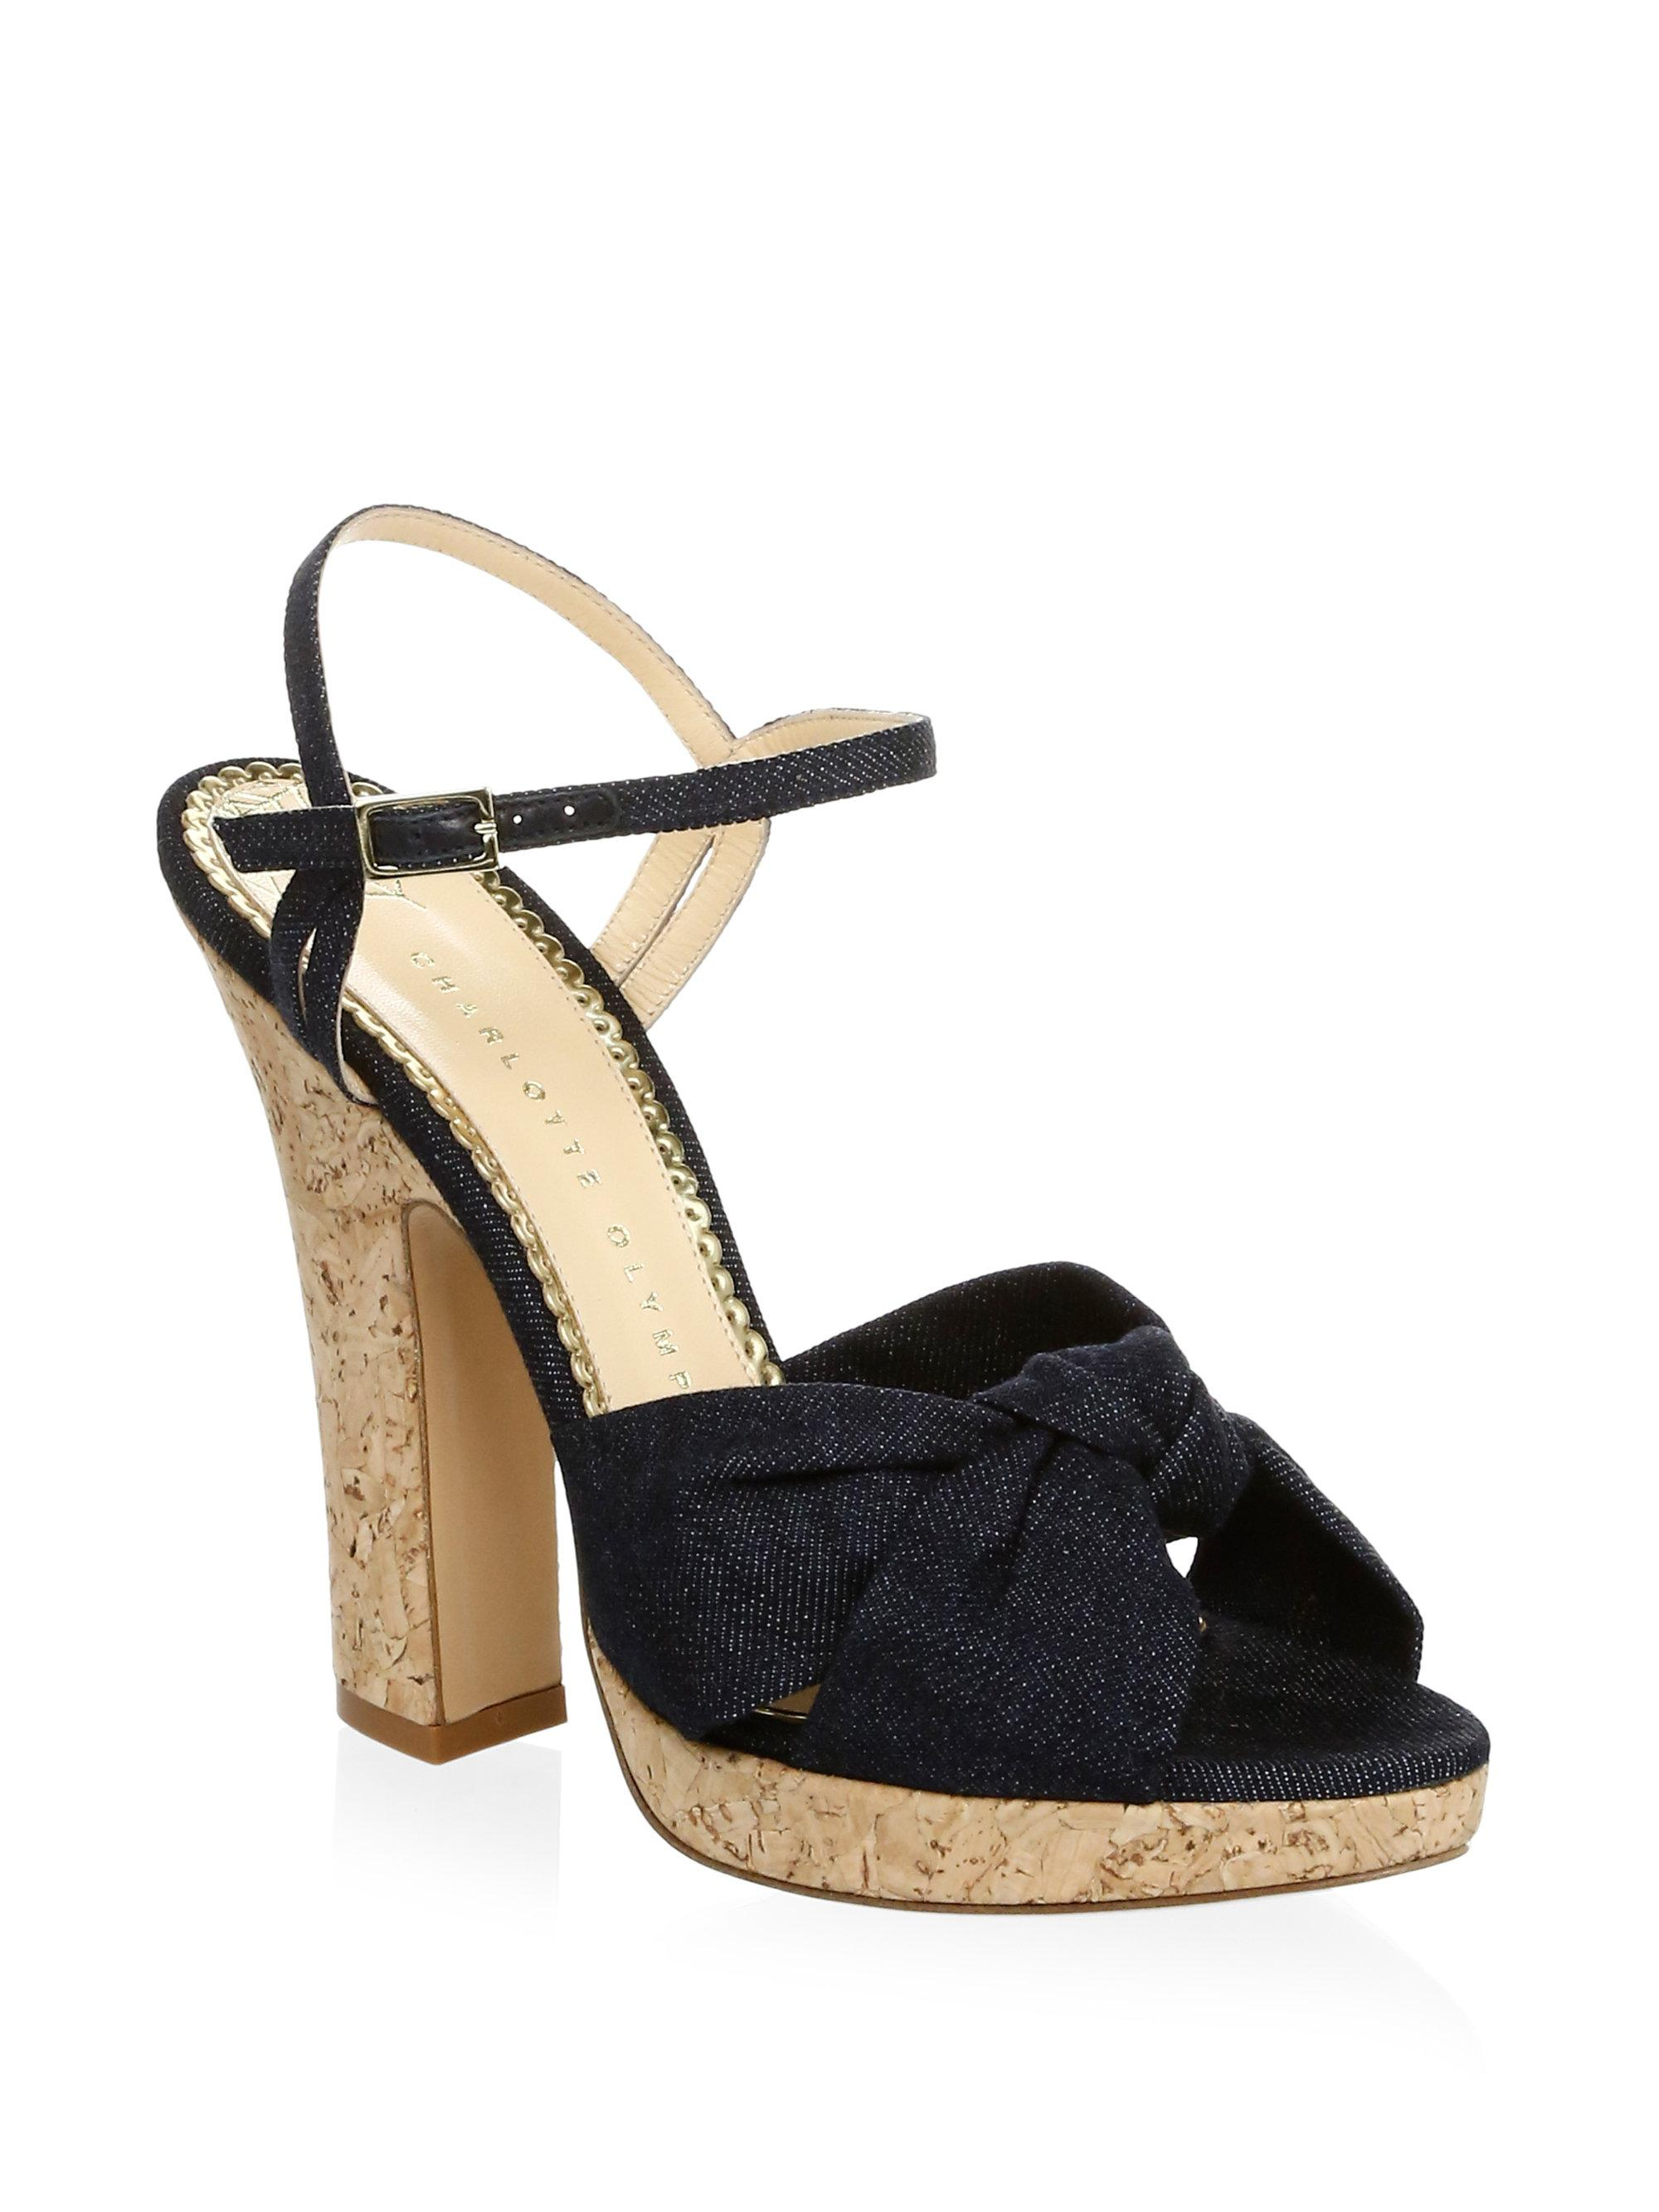 Charlotte Olympia Denim Ankle-Strap Sandals